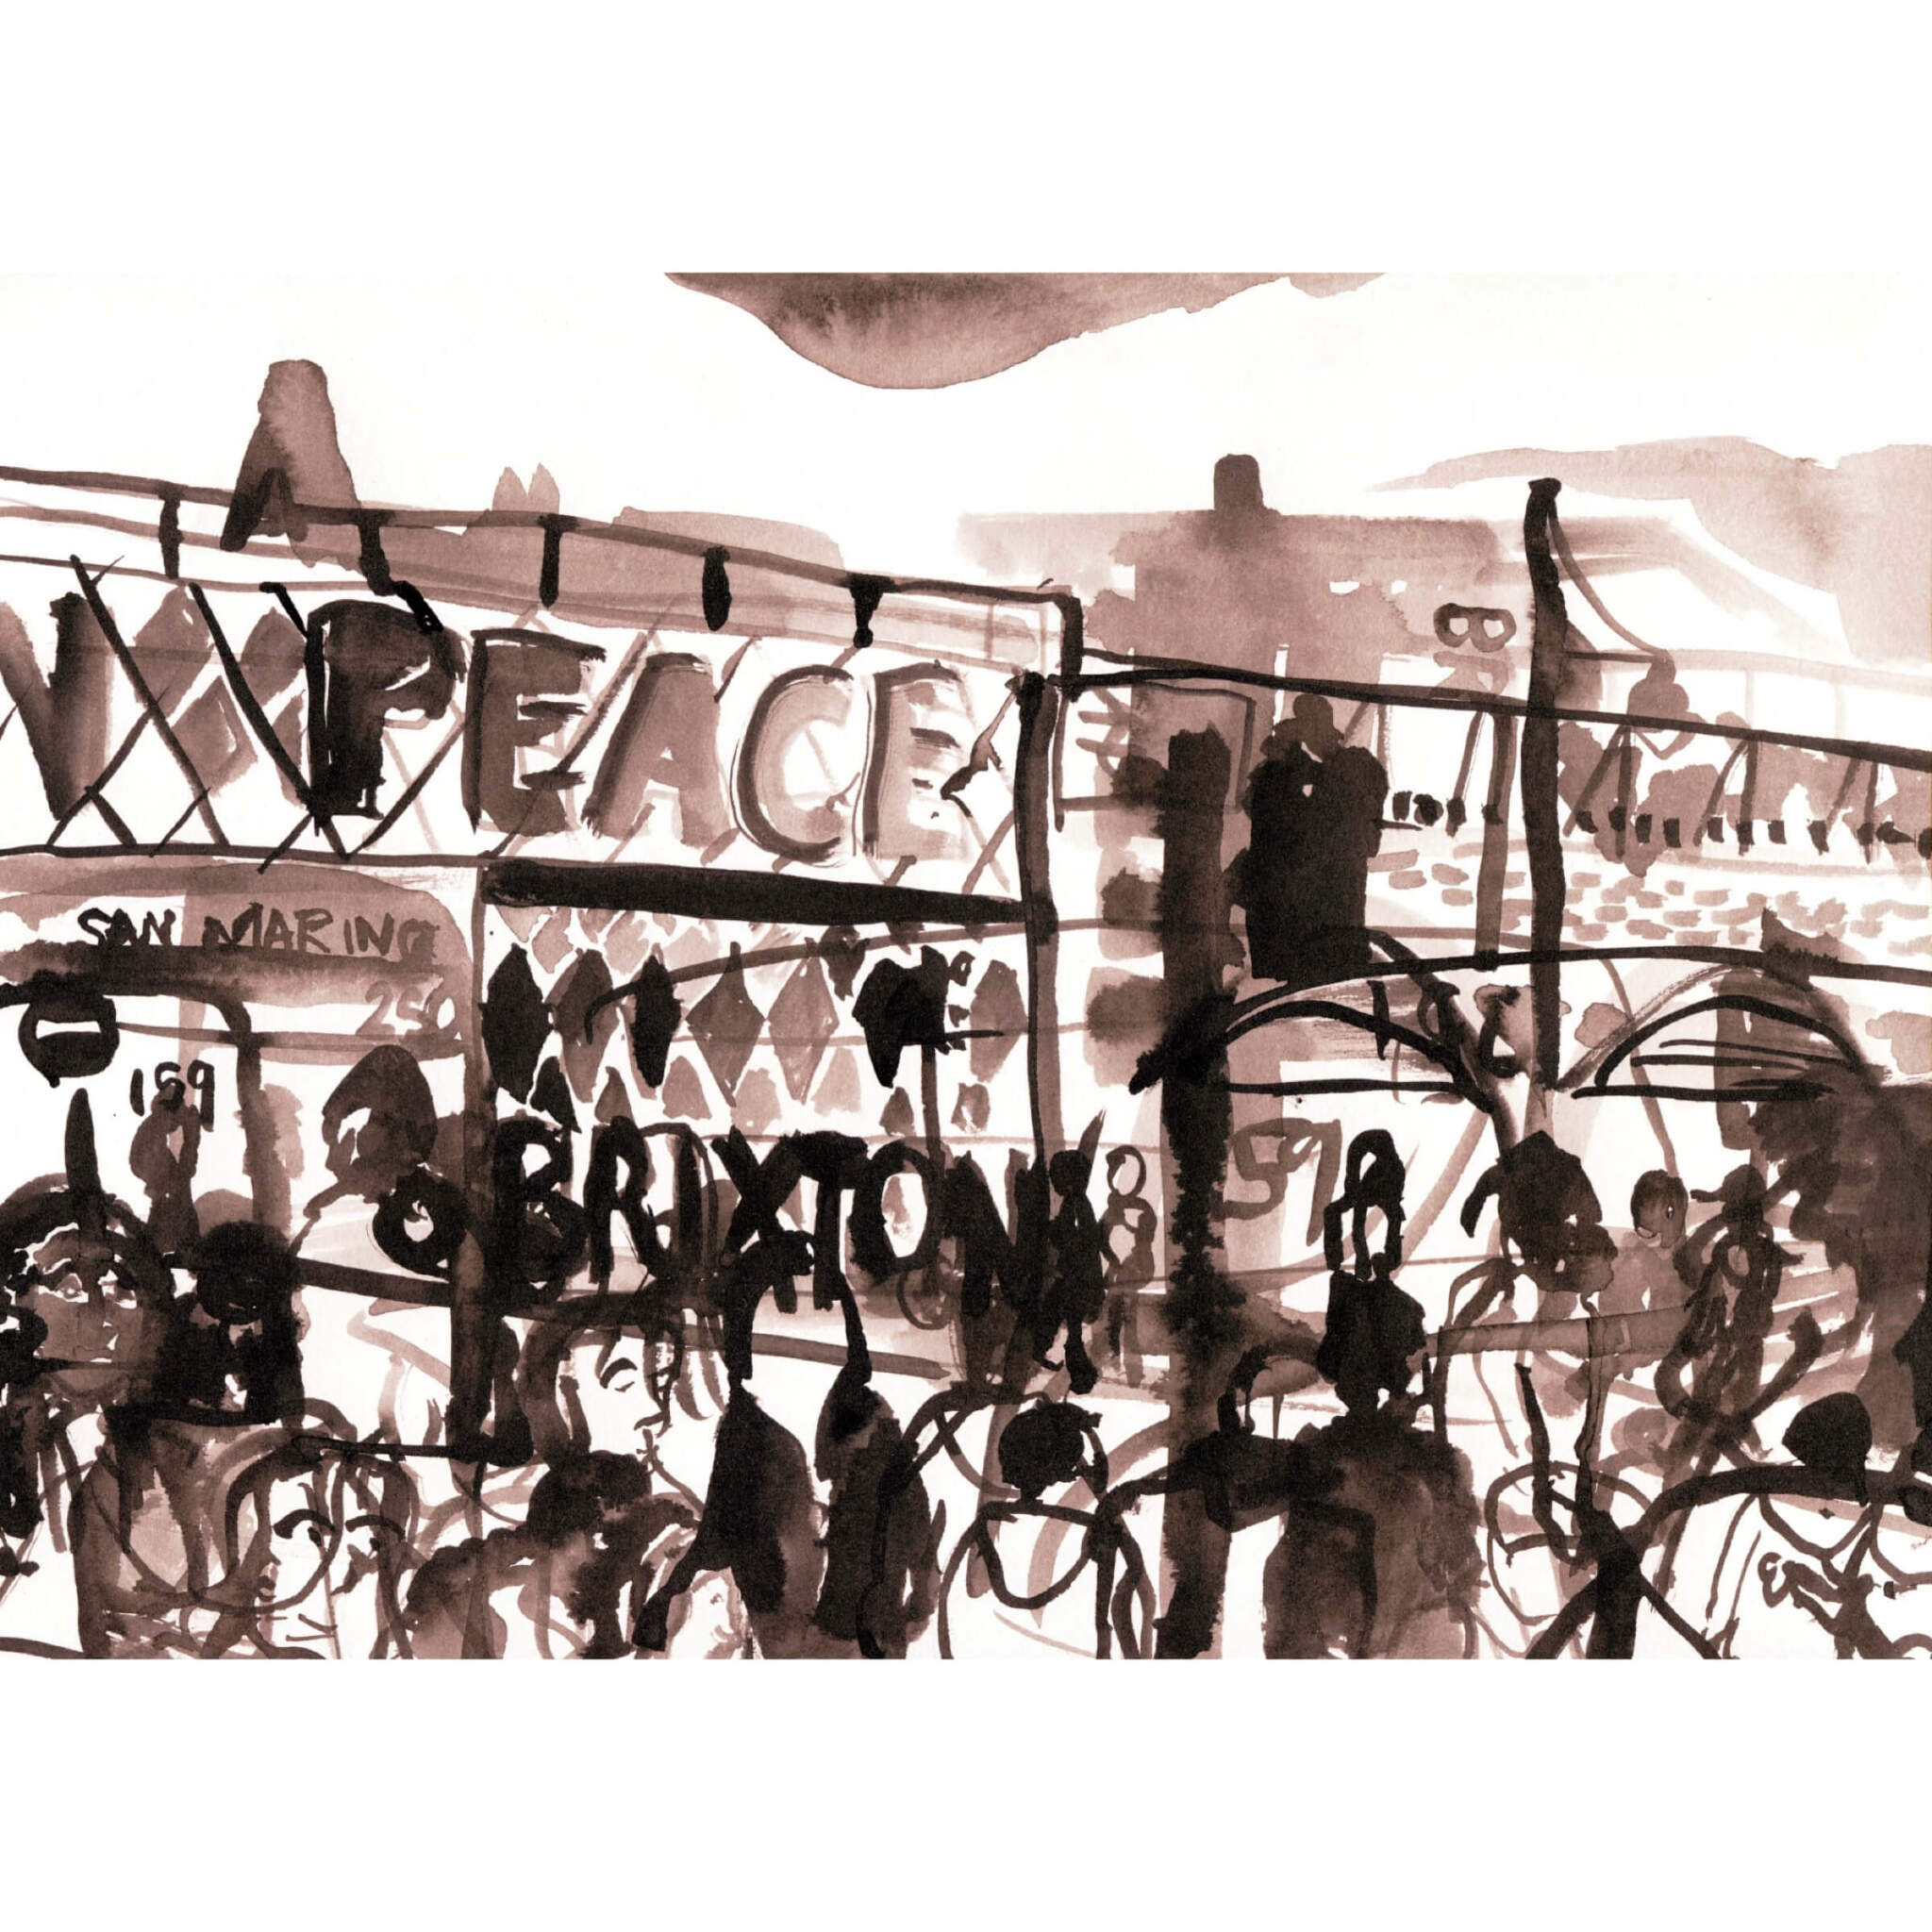 IMG 8752 - Brixton Peace Bridge by Kirsty Jones